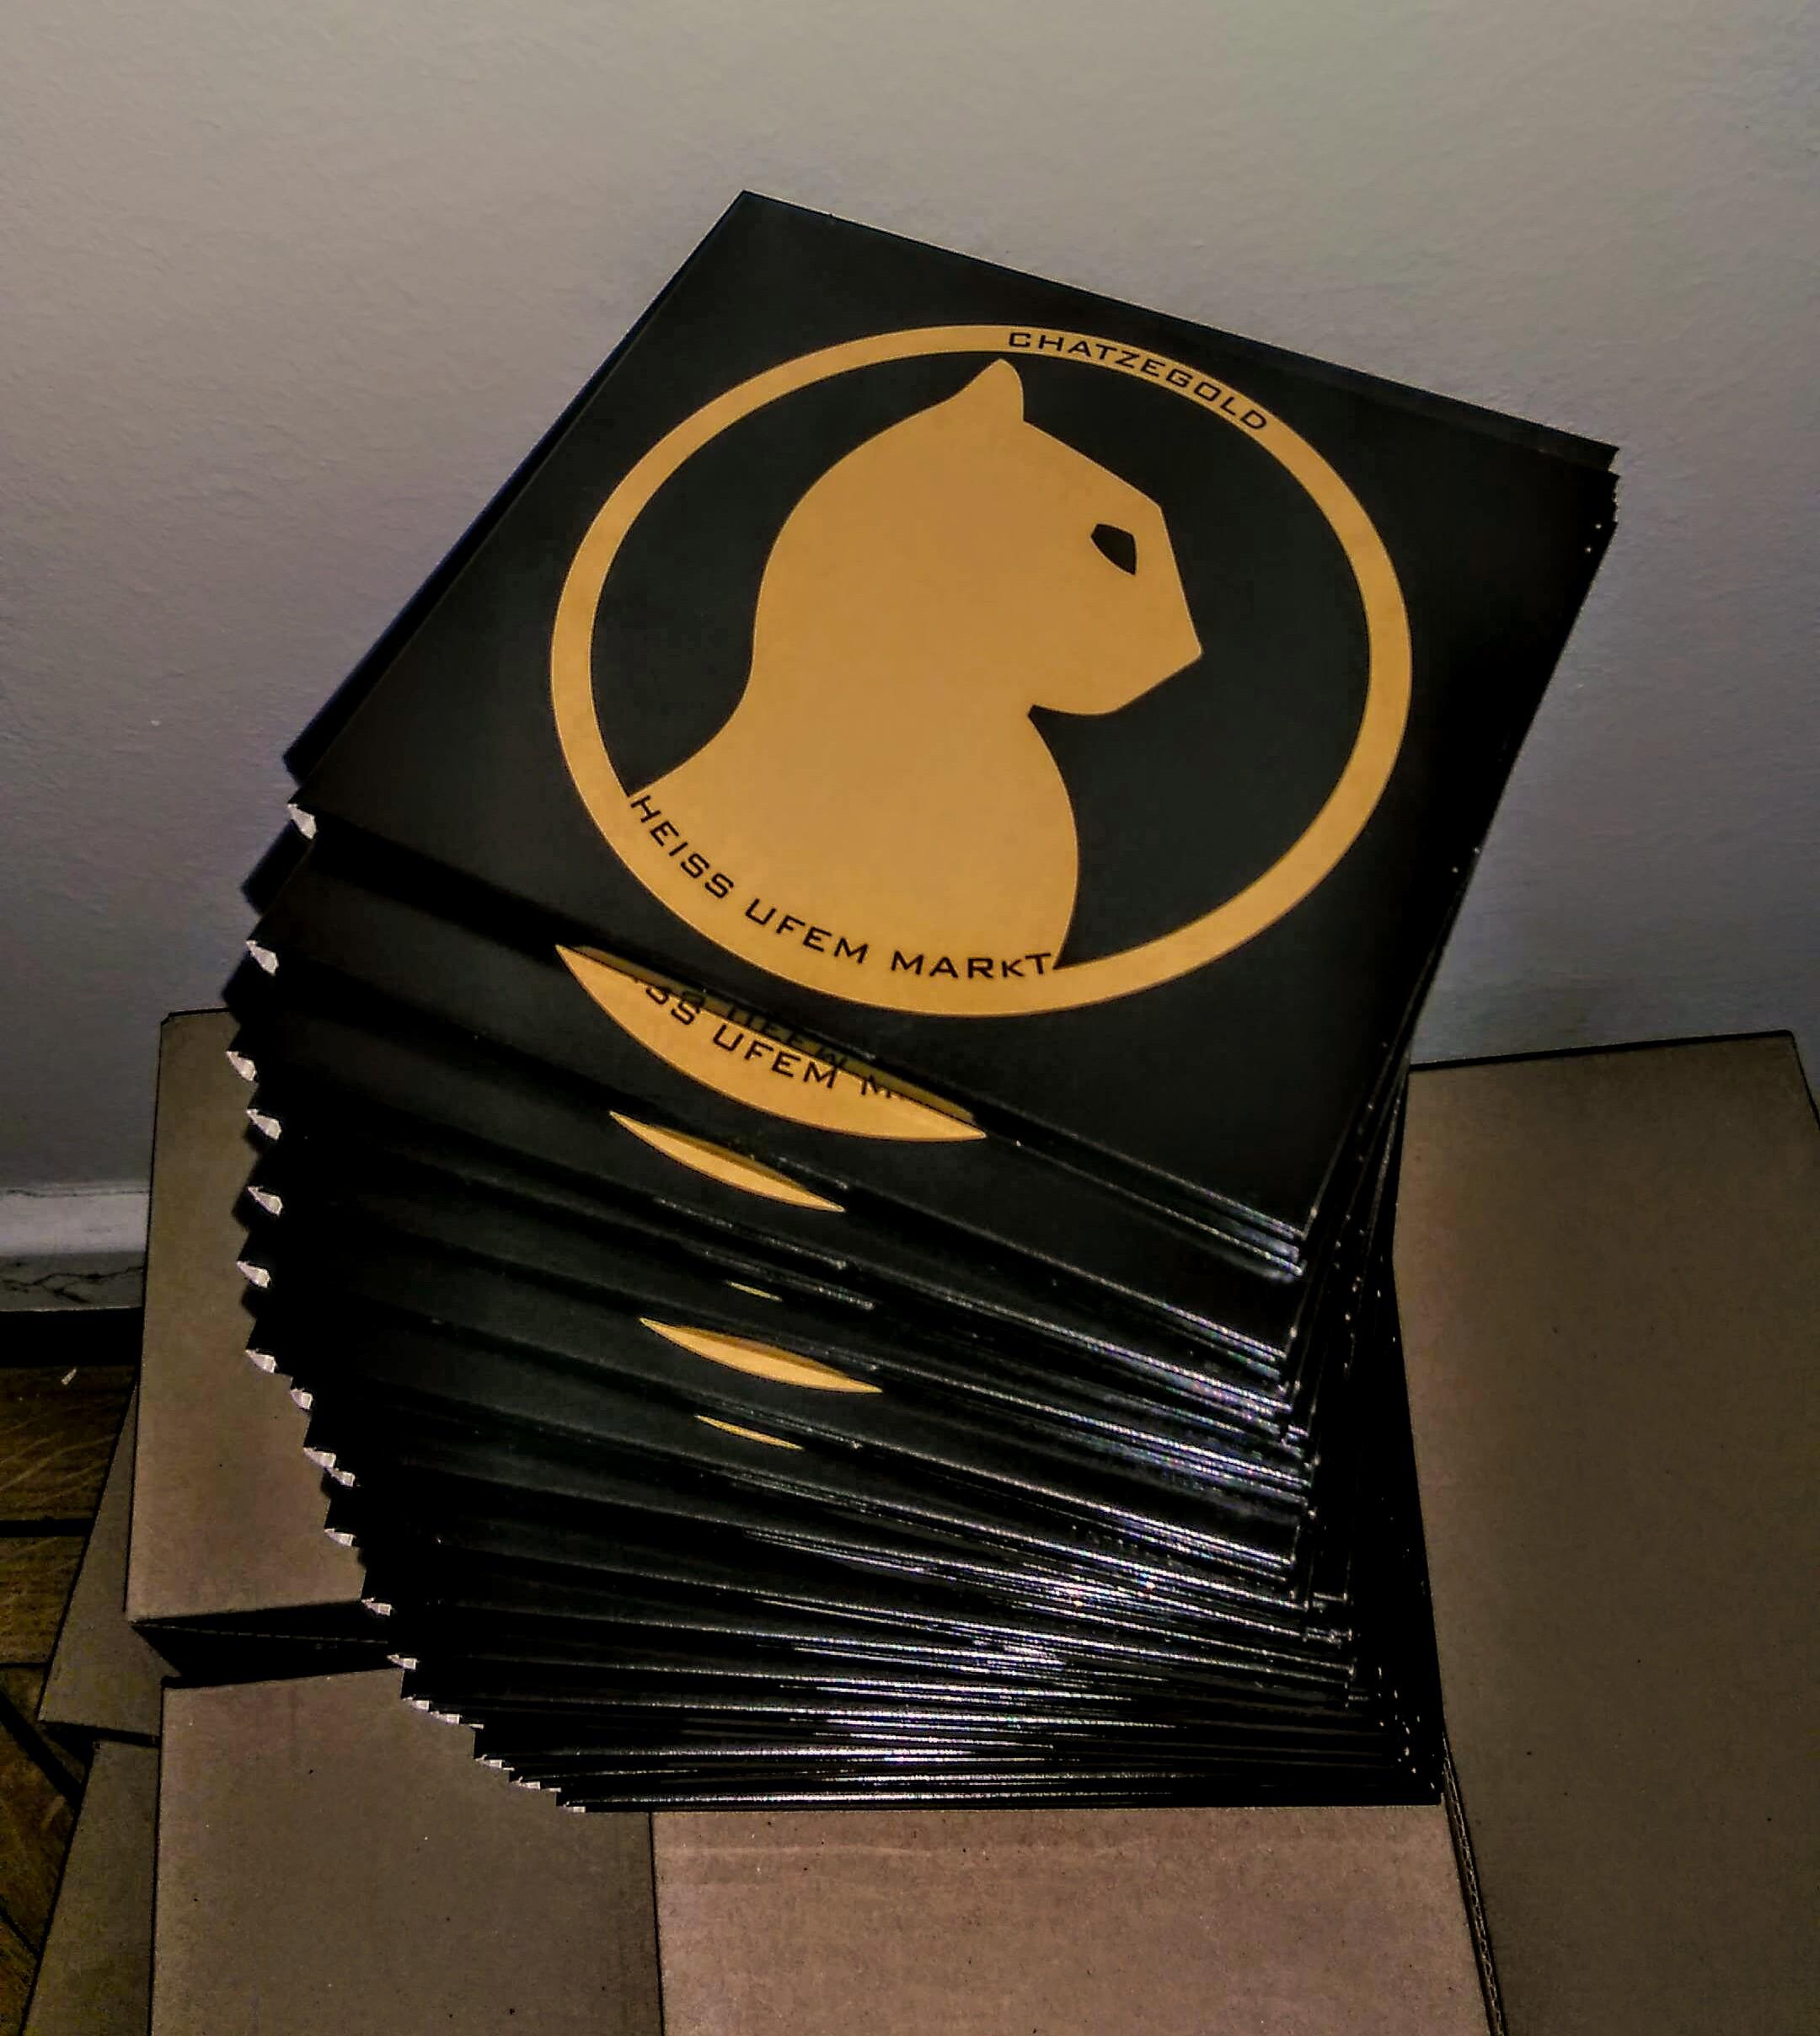 CD kaufen bei: Atlantis Records (Basel), Bro Rec (St.Gallen), Z-Records (St.Gallen), Ventilator Records (Winterthur), Jama Records (Zürich), ZeroZero (Zürich), Rec Rec (Zürich)  Onlilne: itunes,google,spotyfy etc.